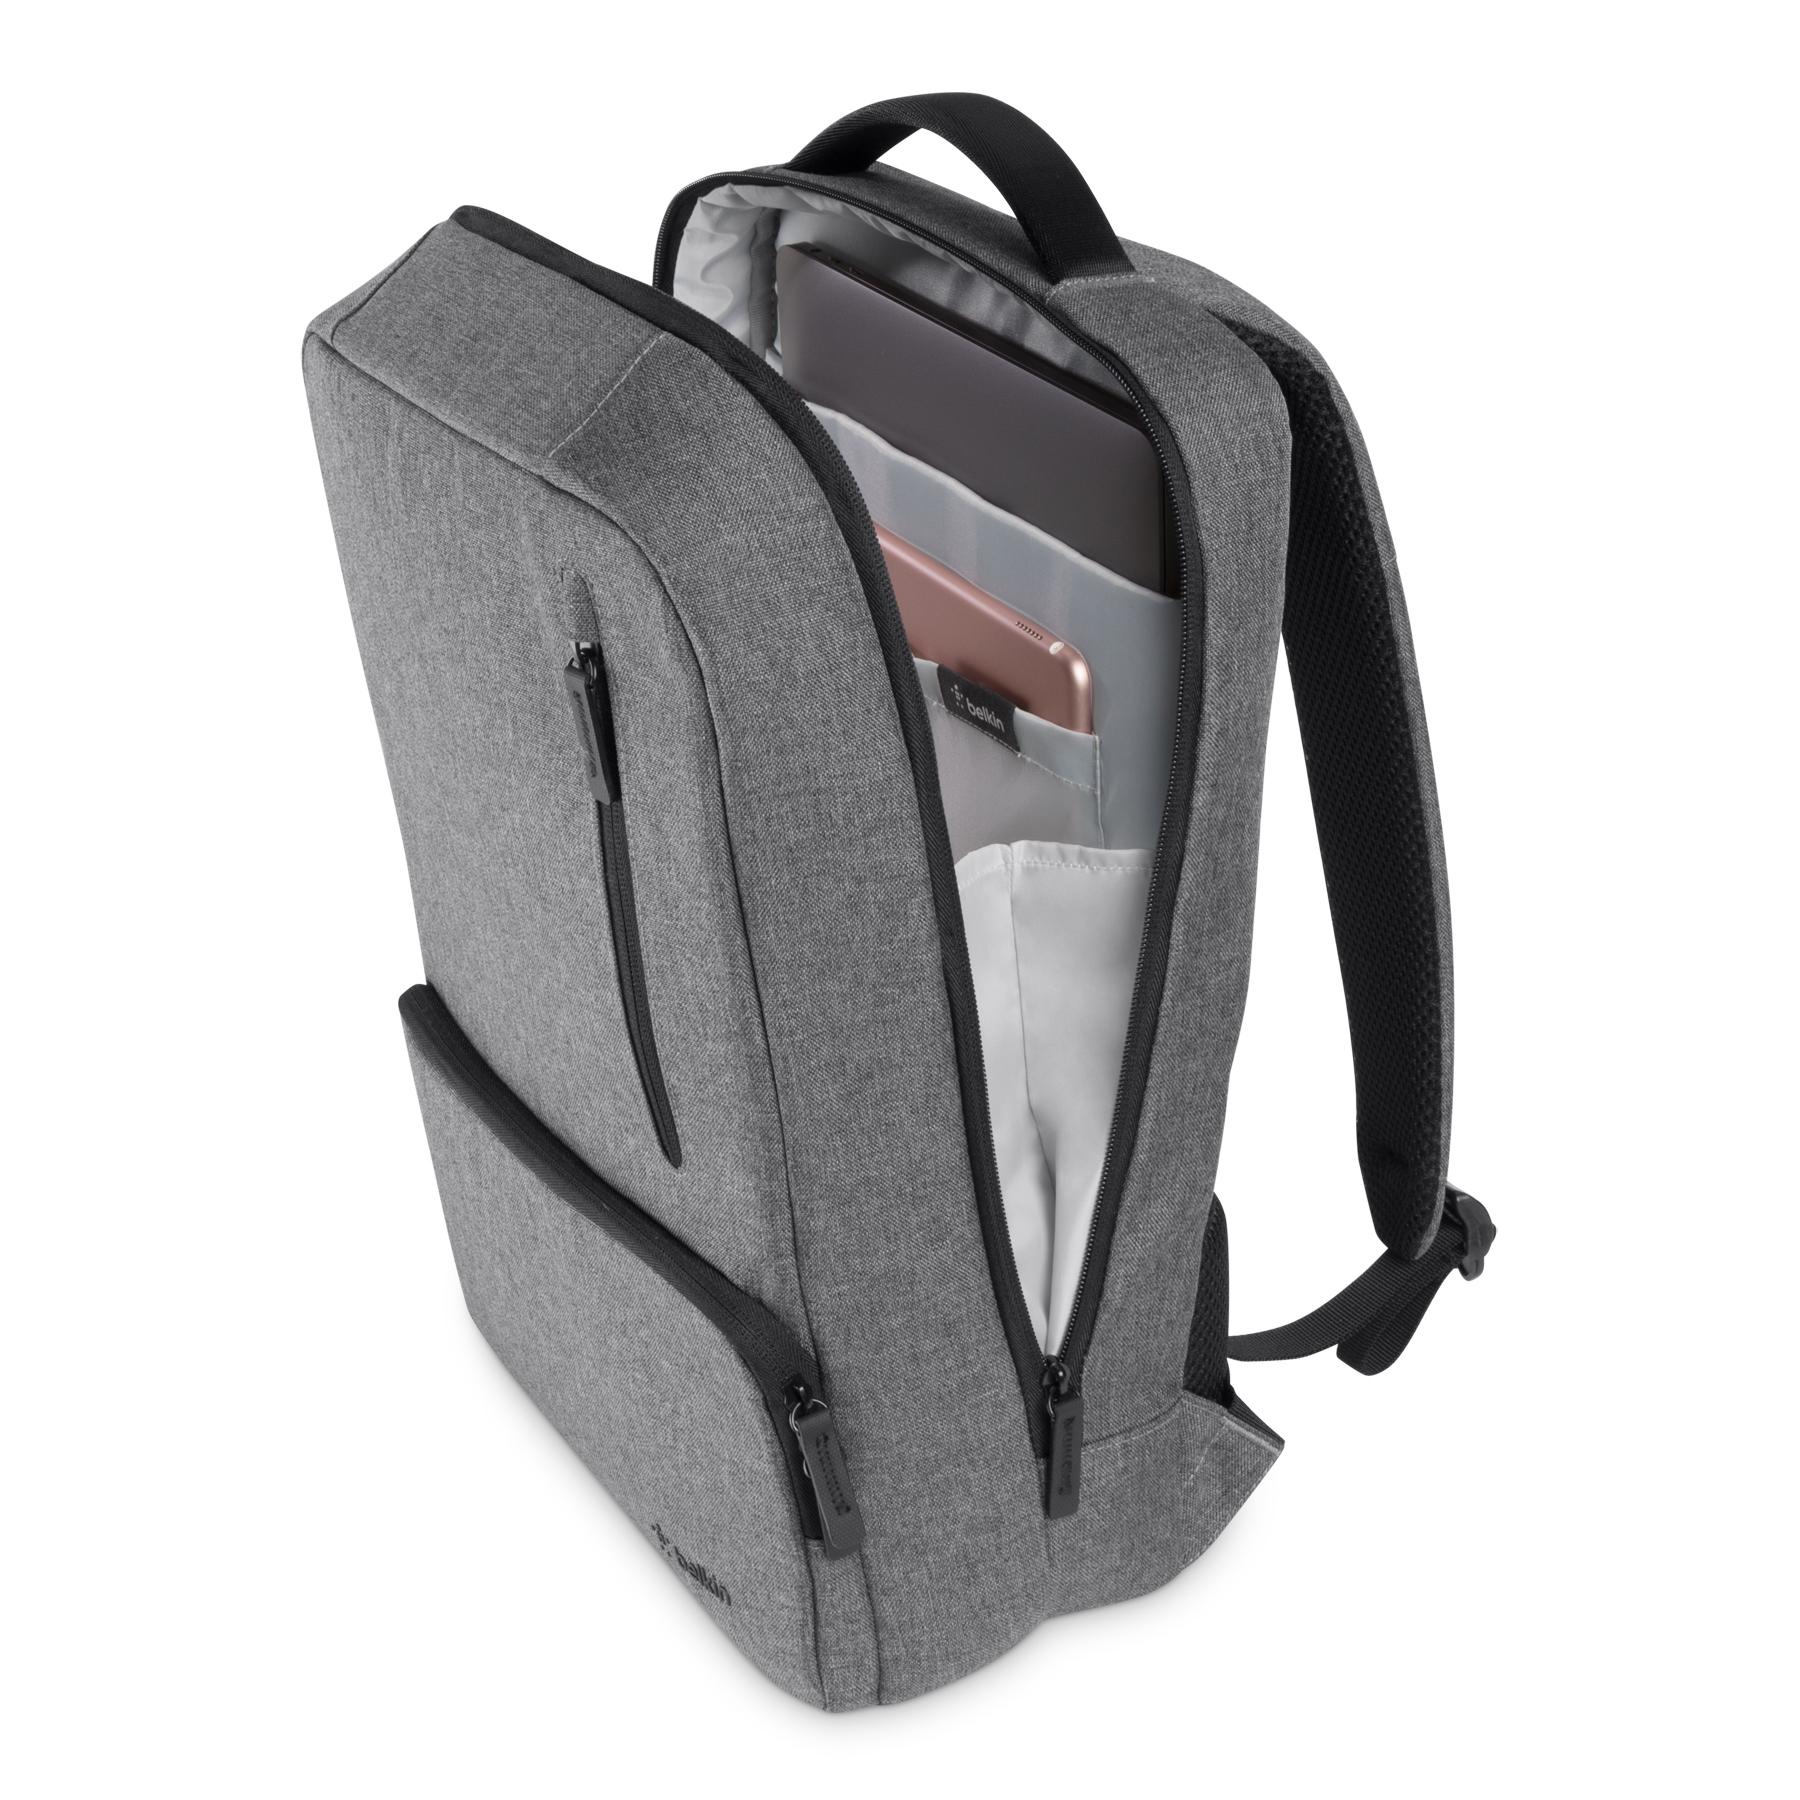 Belkin Classic Pro Backpack Belkin Revamps Bag Lineup